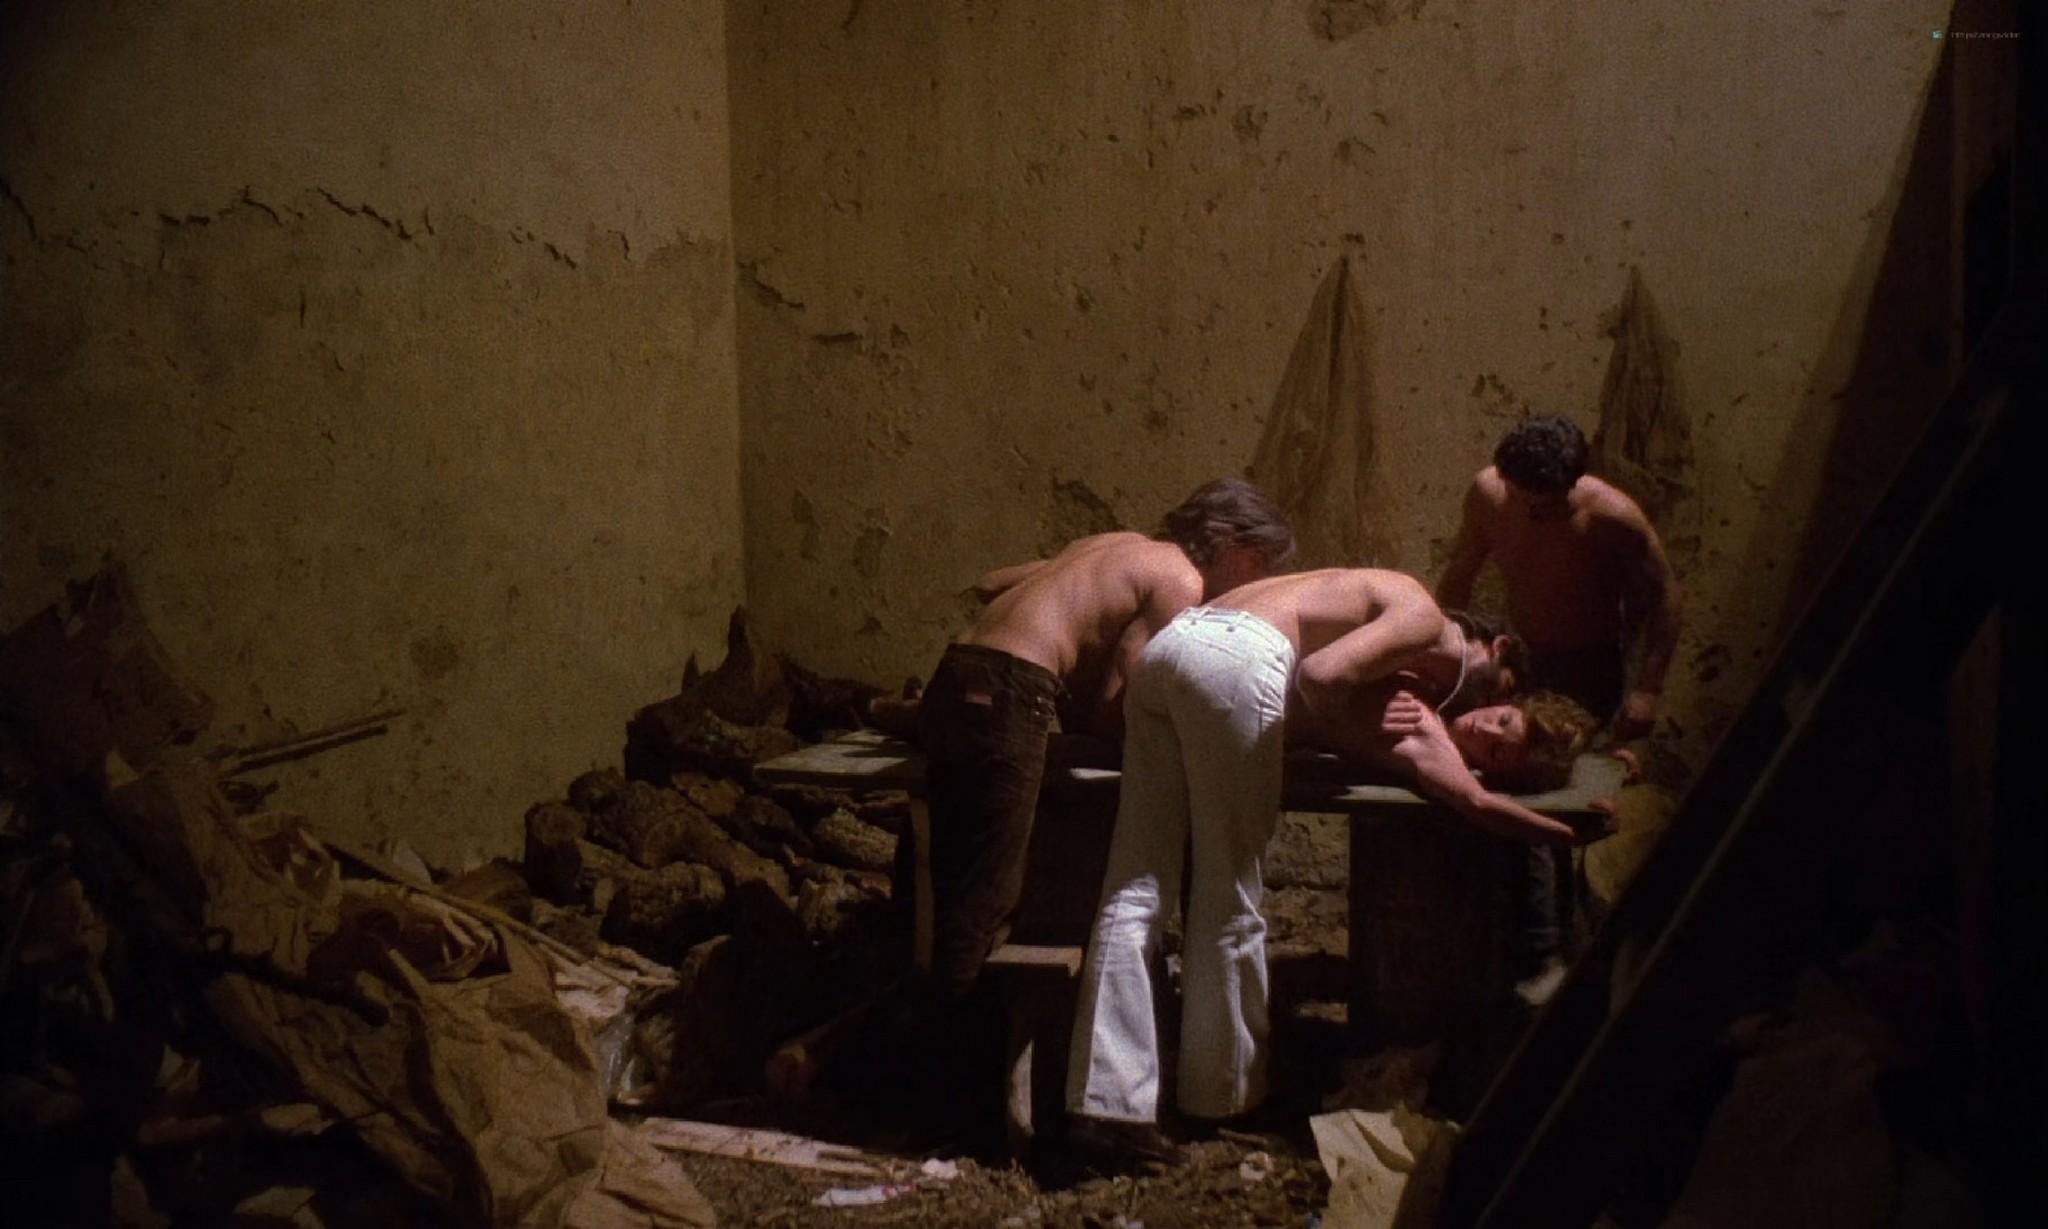 Muriel Montosse nude full frontal Ana Paula Lina Romay nude too Cecilia 1983 HD 1080p BluRay REMUX 014